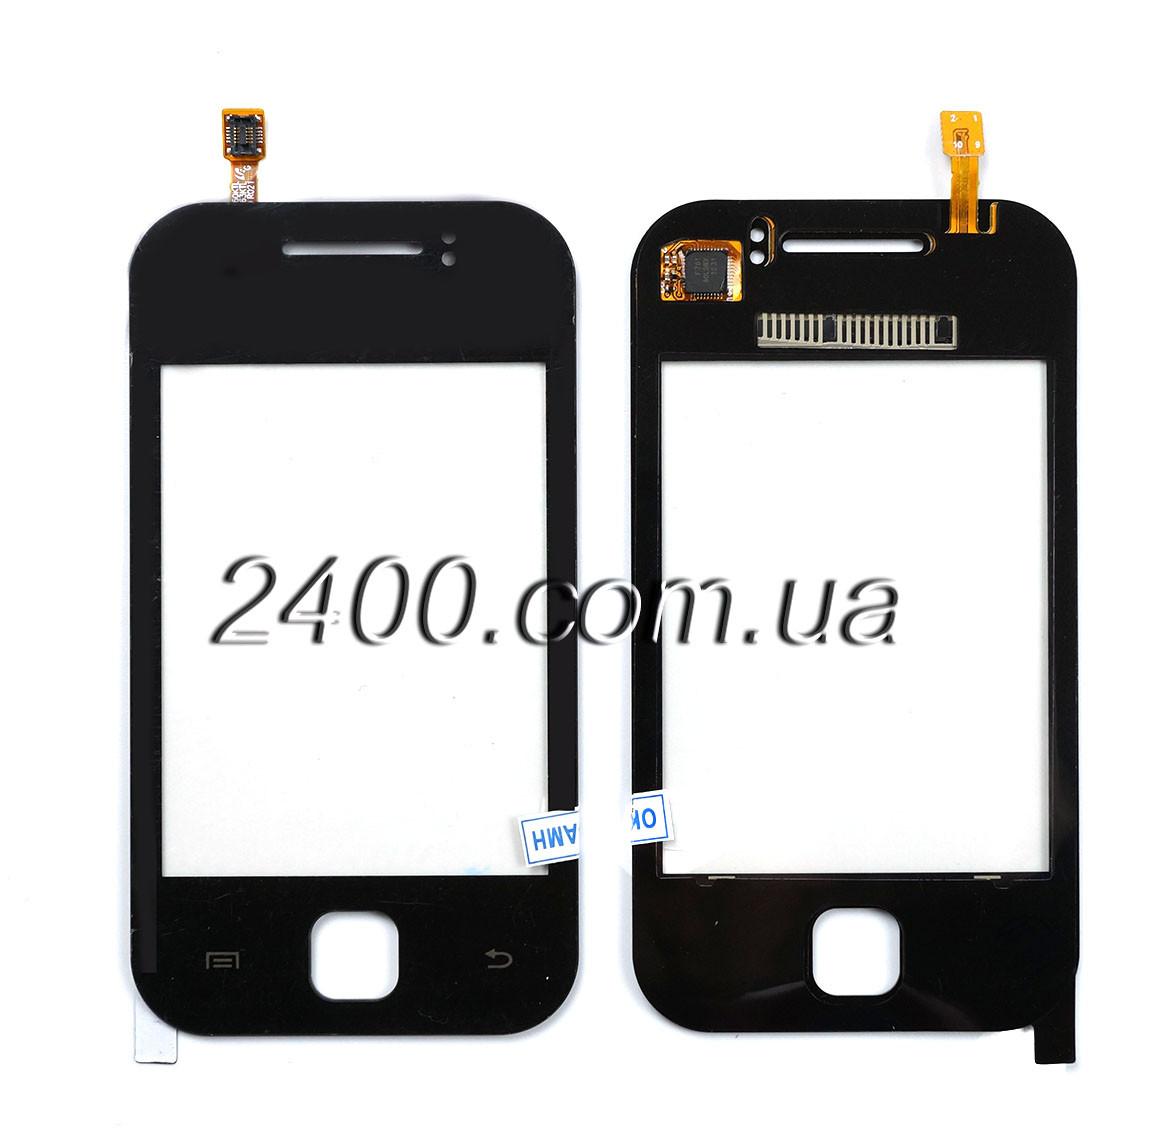 Сенсор Samsung S5360 (тачскрин) - touch screen для Samsung S 5360 (Самсунг S5360) черный